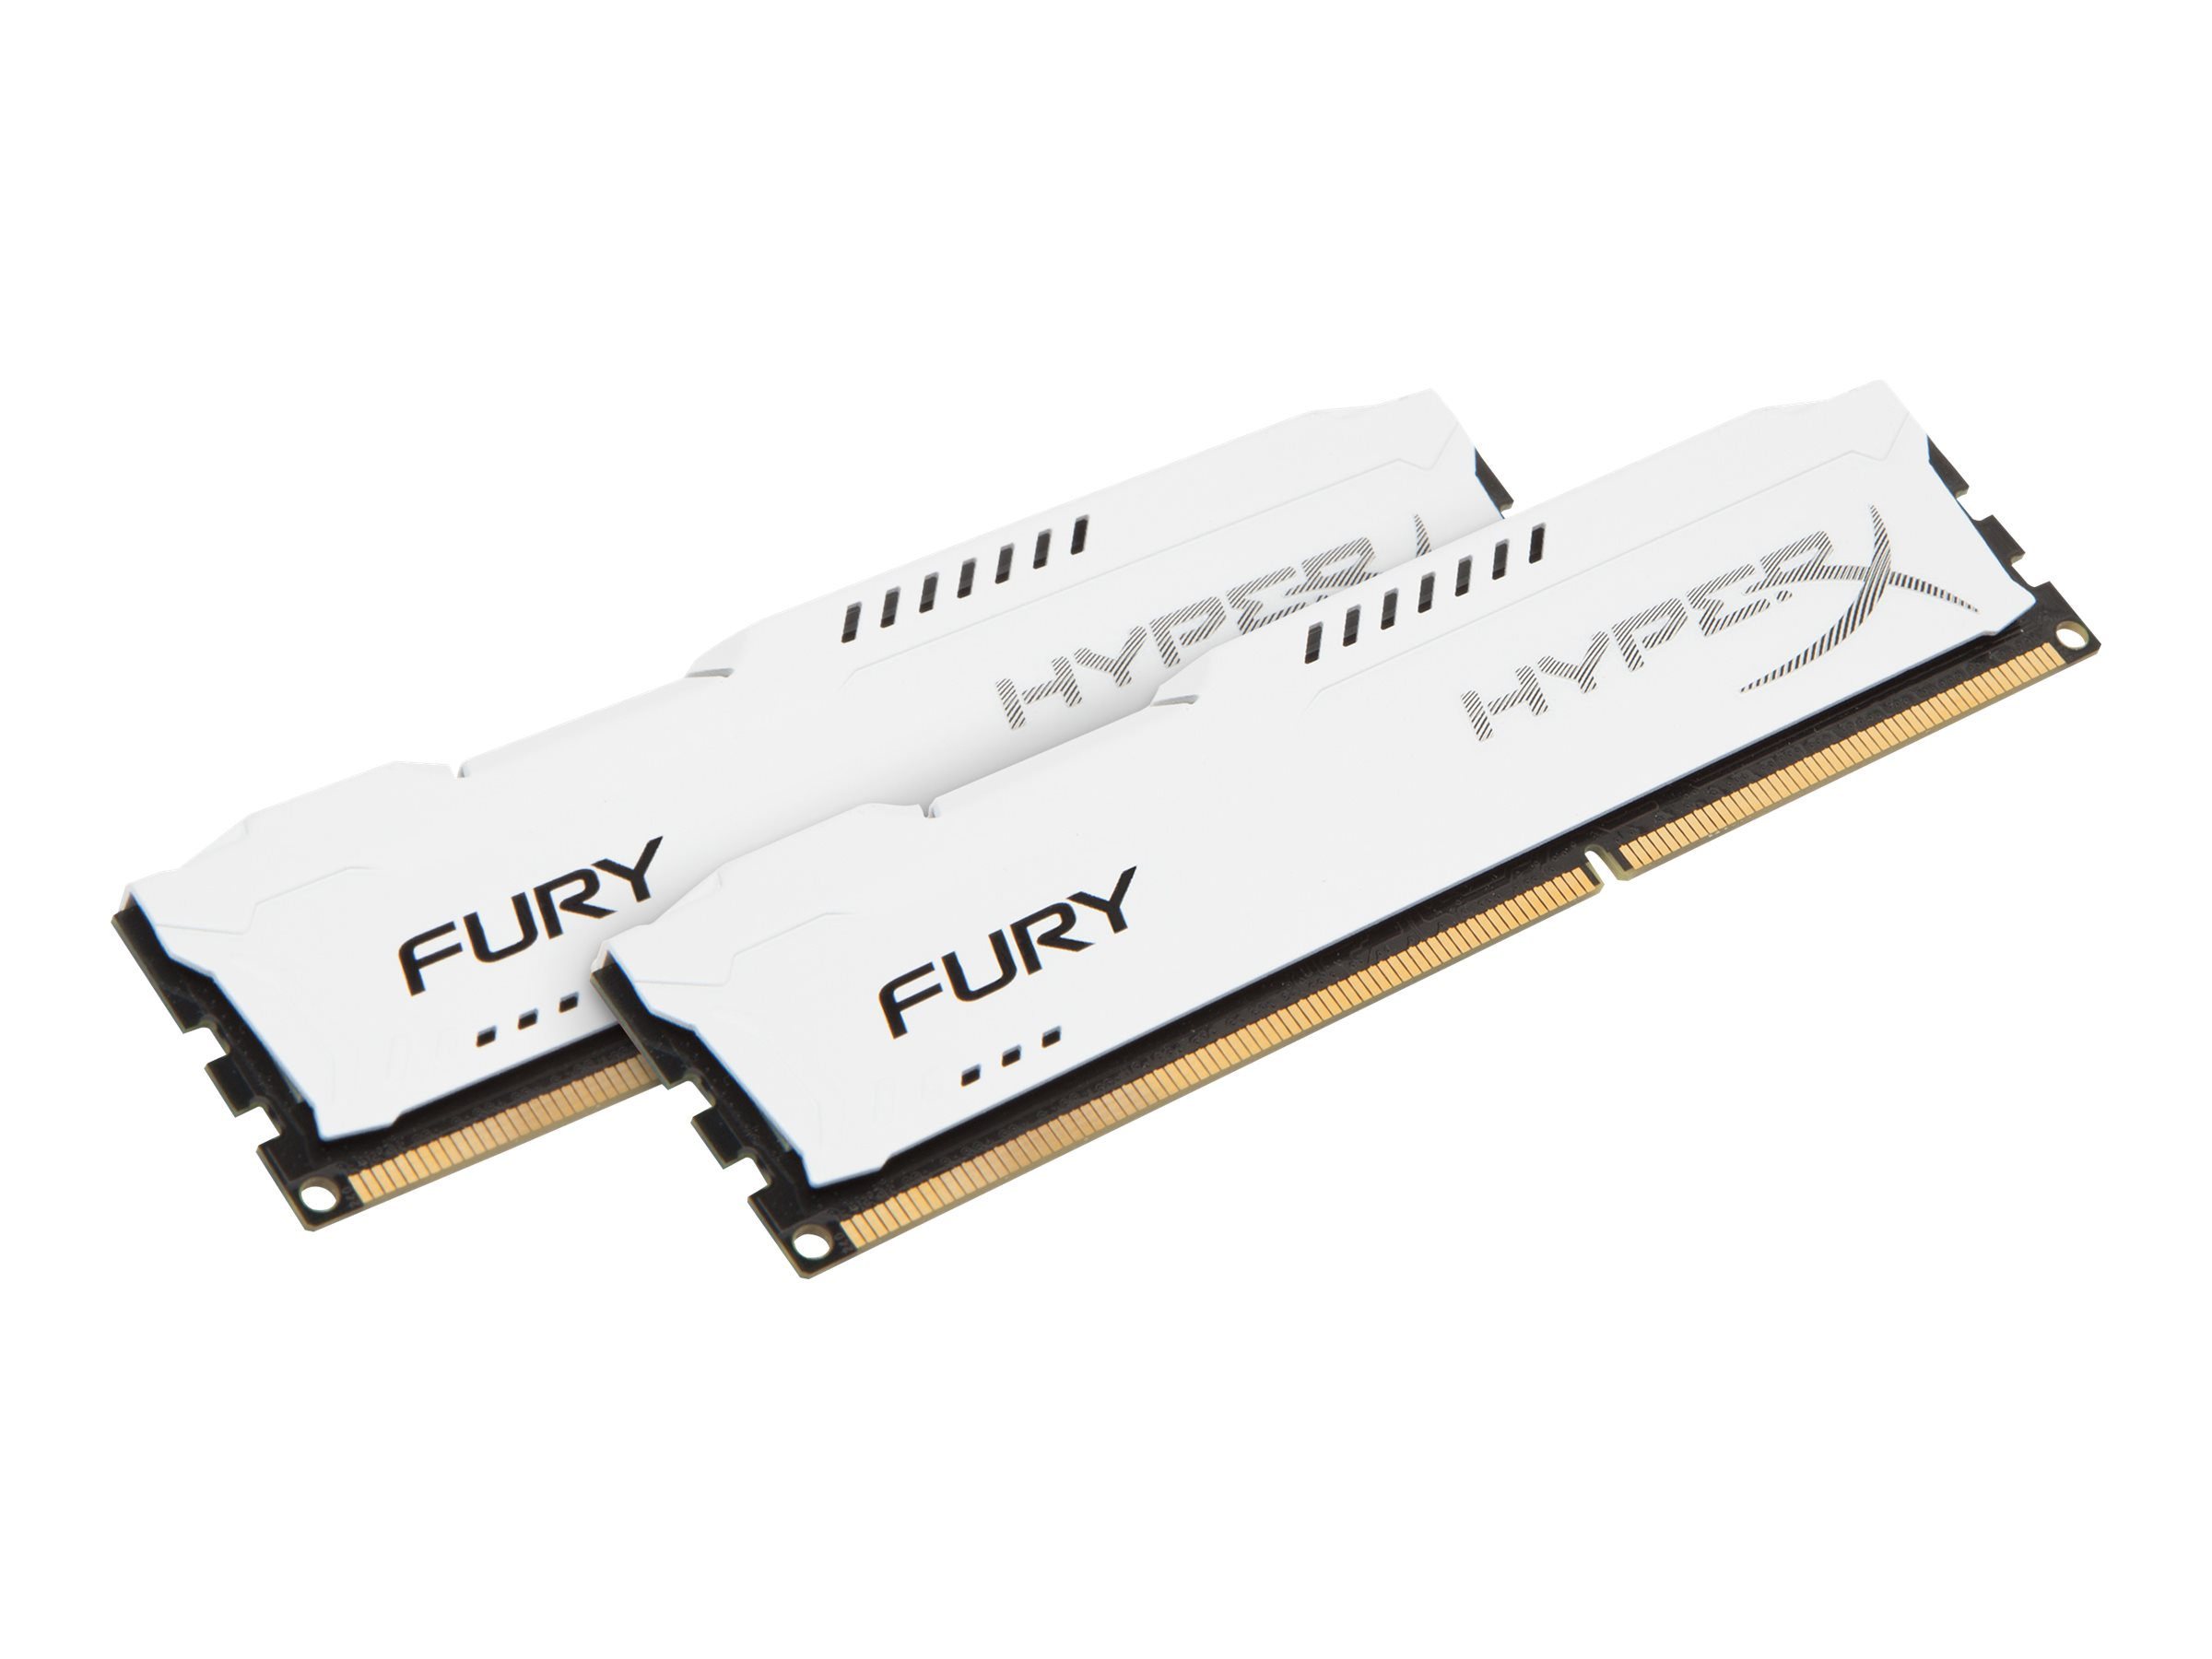 HyperX FURY - DDR3 - 16 GB: 2 x 8 GB - DIMM 240-PIN - 1866 MHz / PC3-14900 - CL10